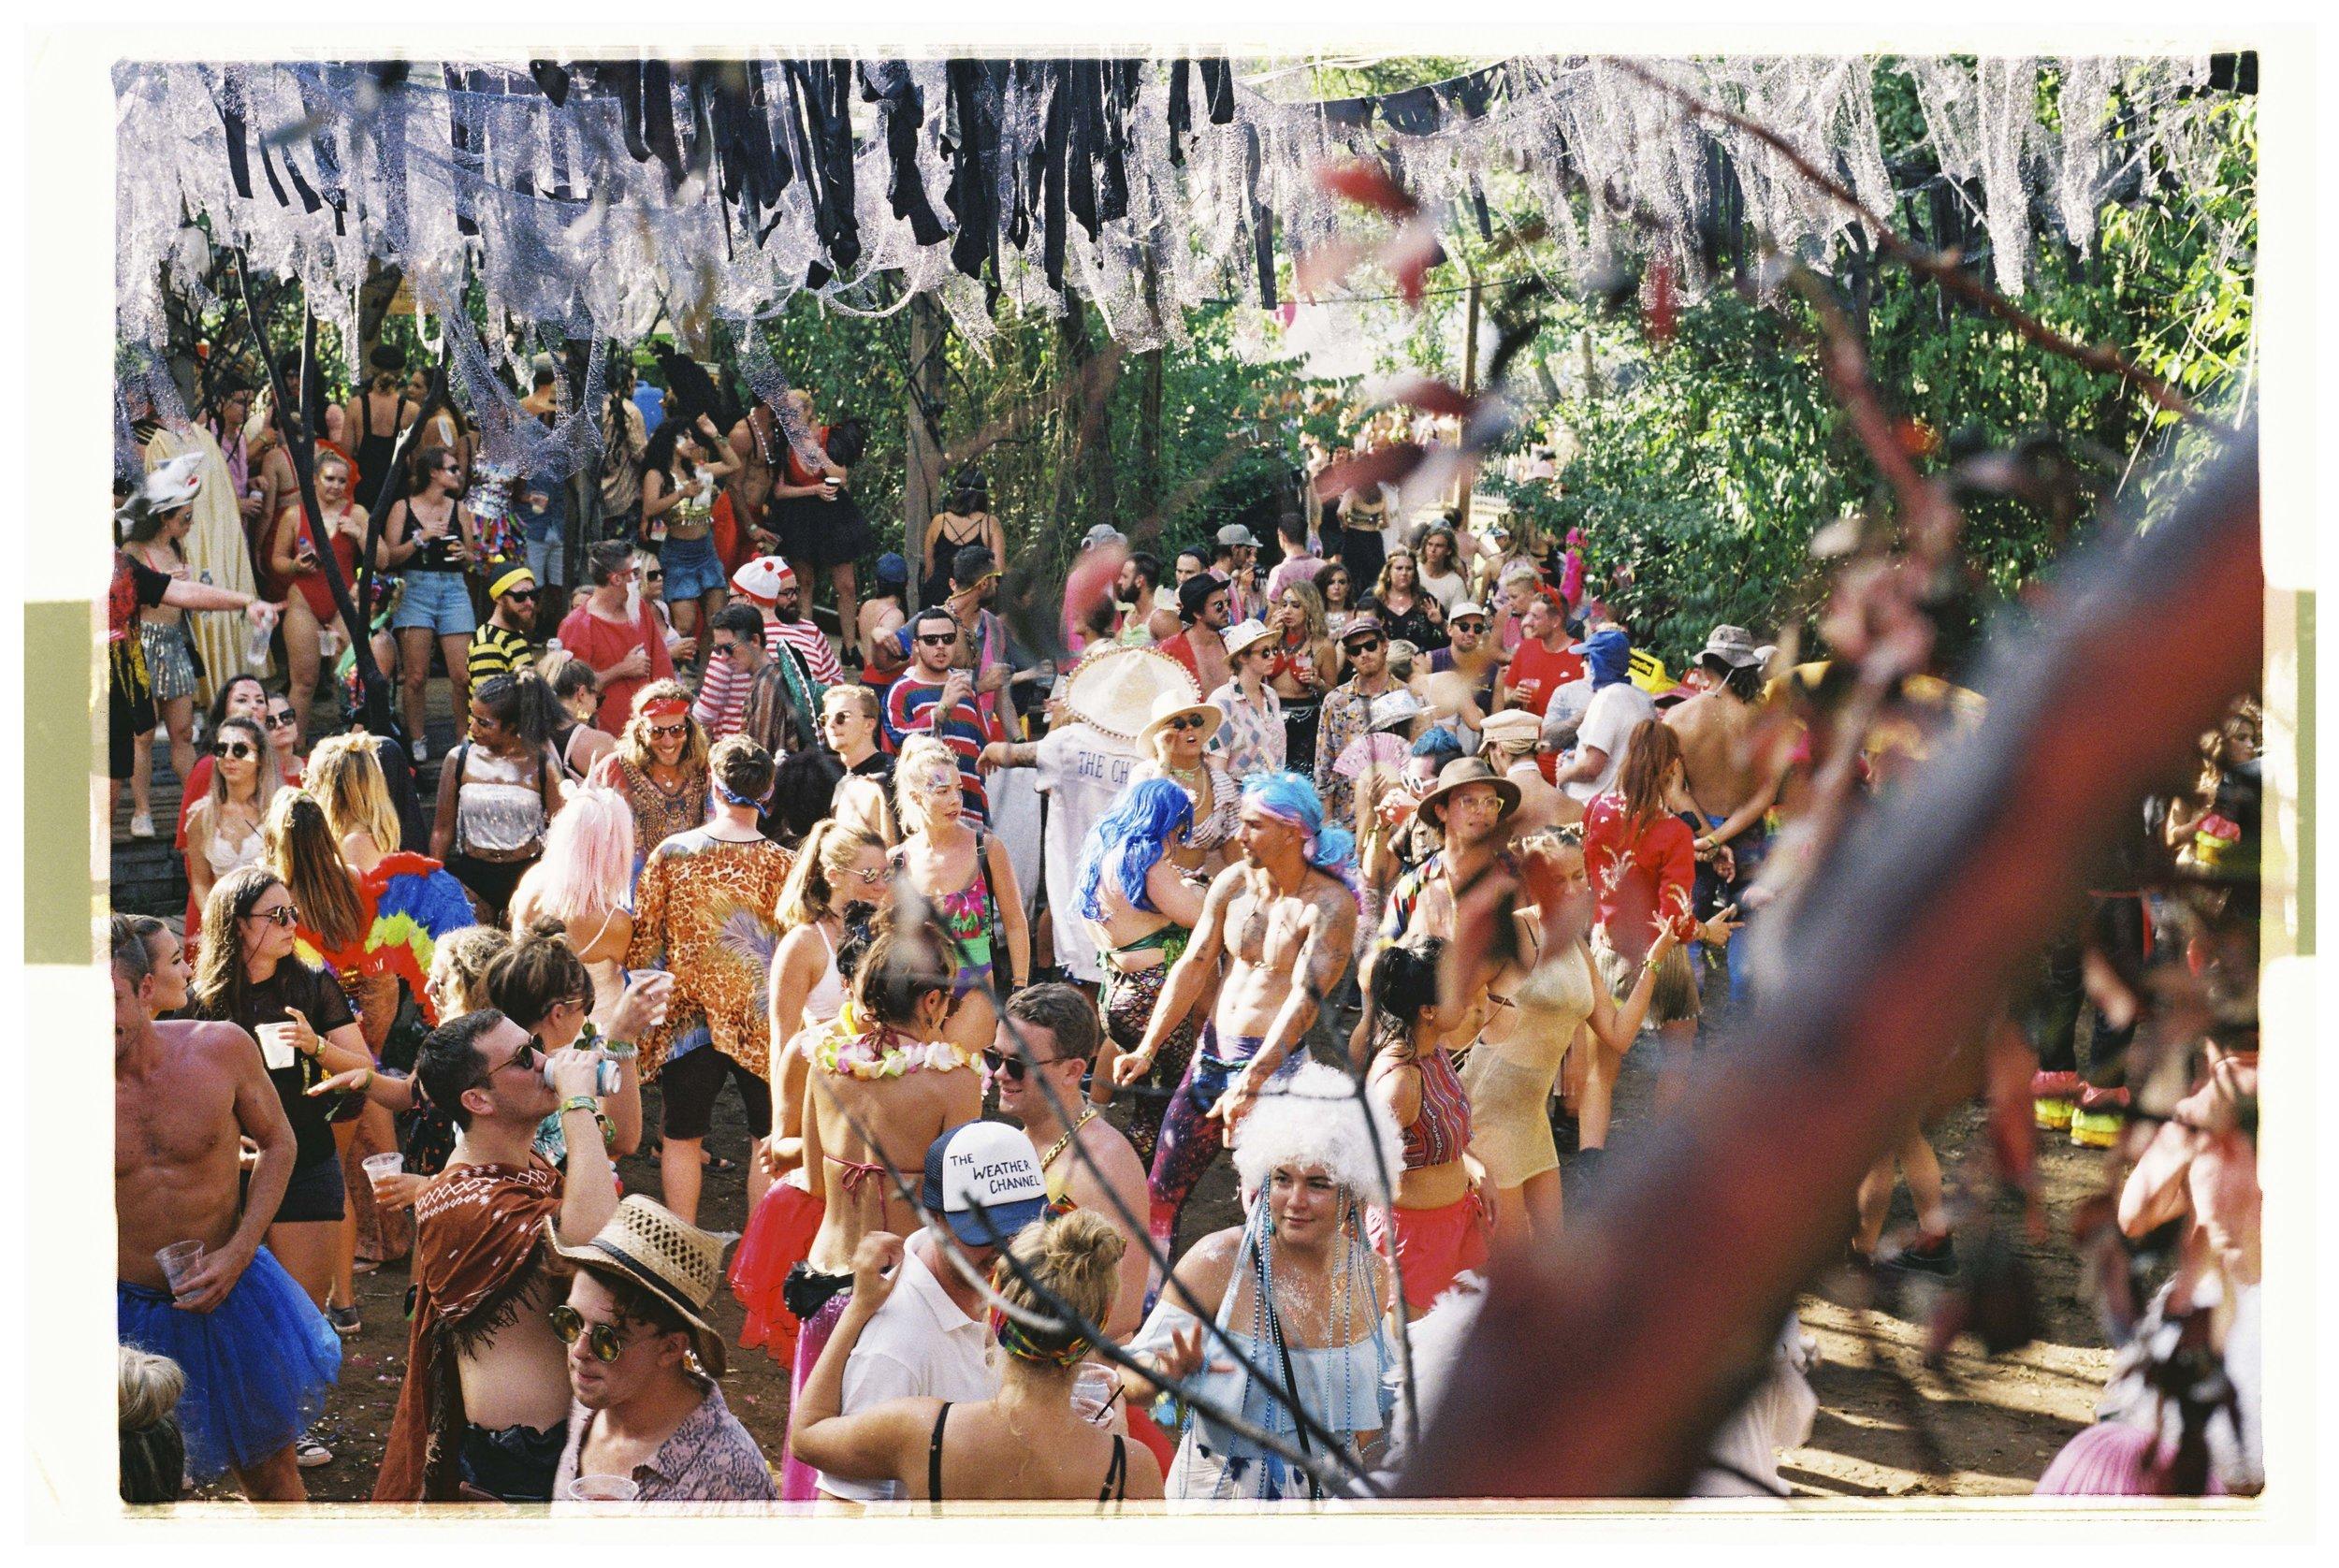 Crowd & Festival - Nikon F3 - Fuji Industrial 100 - 20.jpg